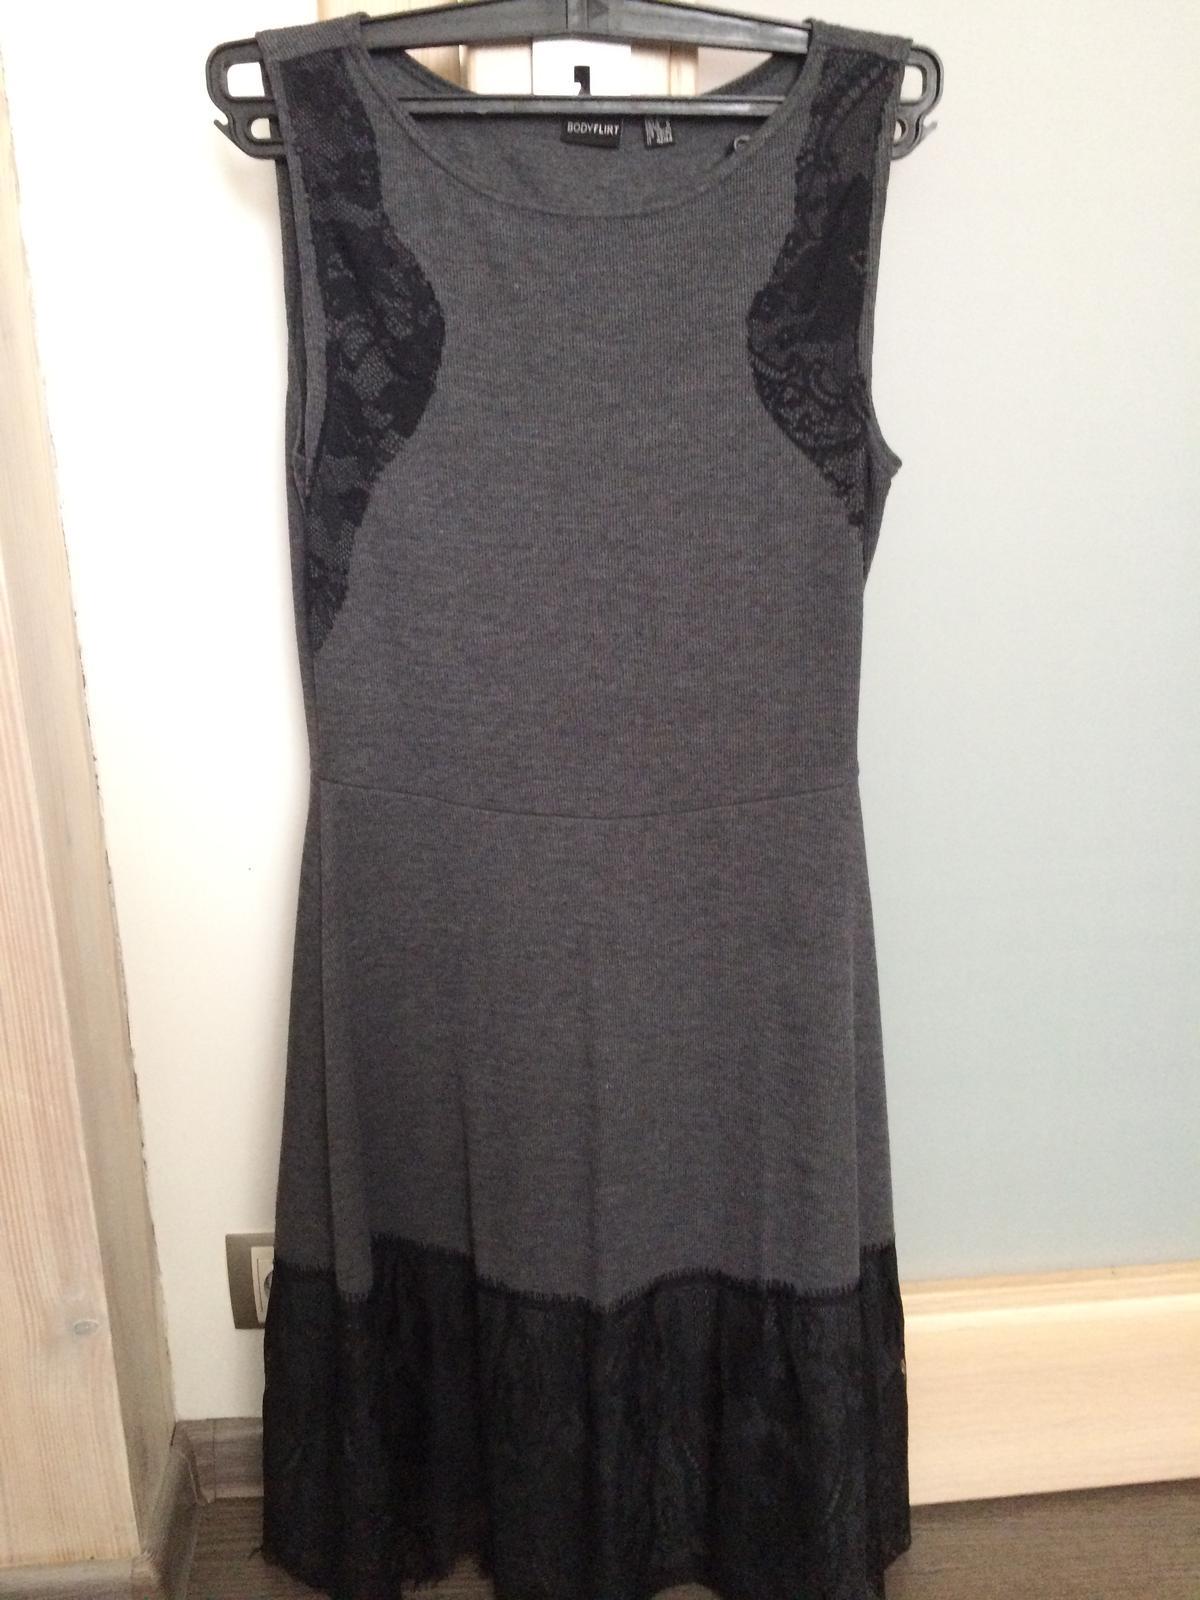 Sivé šaty - Obrázok č. 1